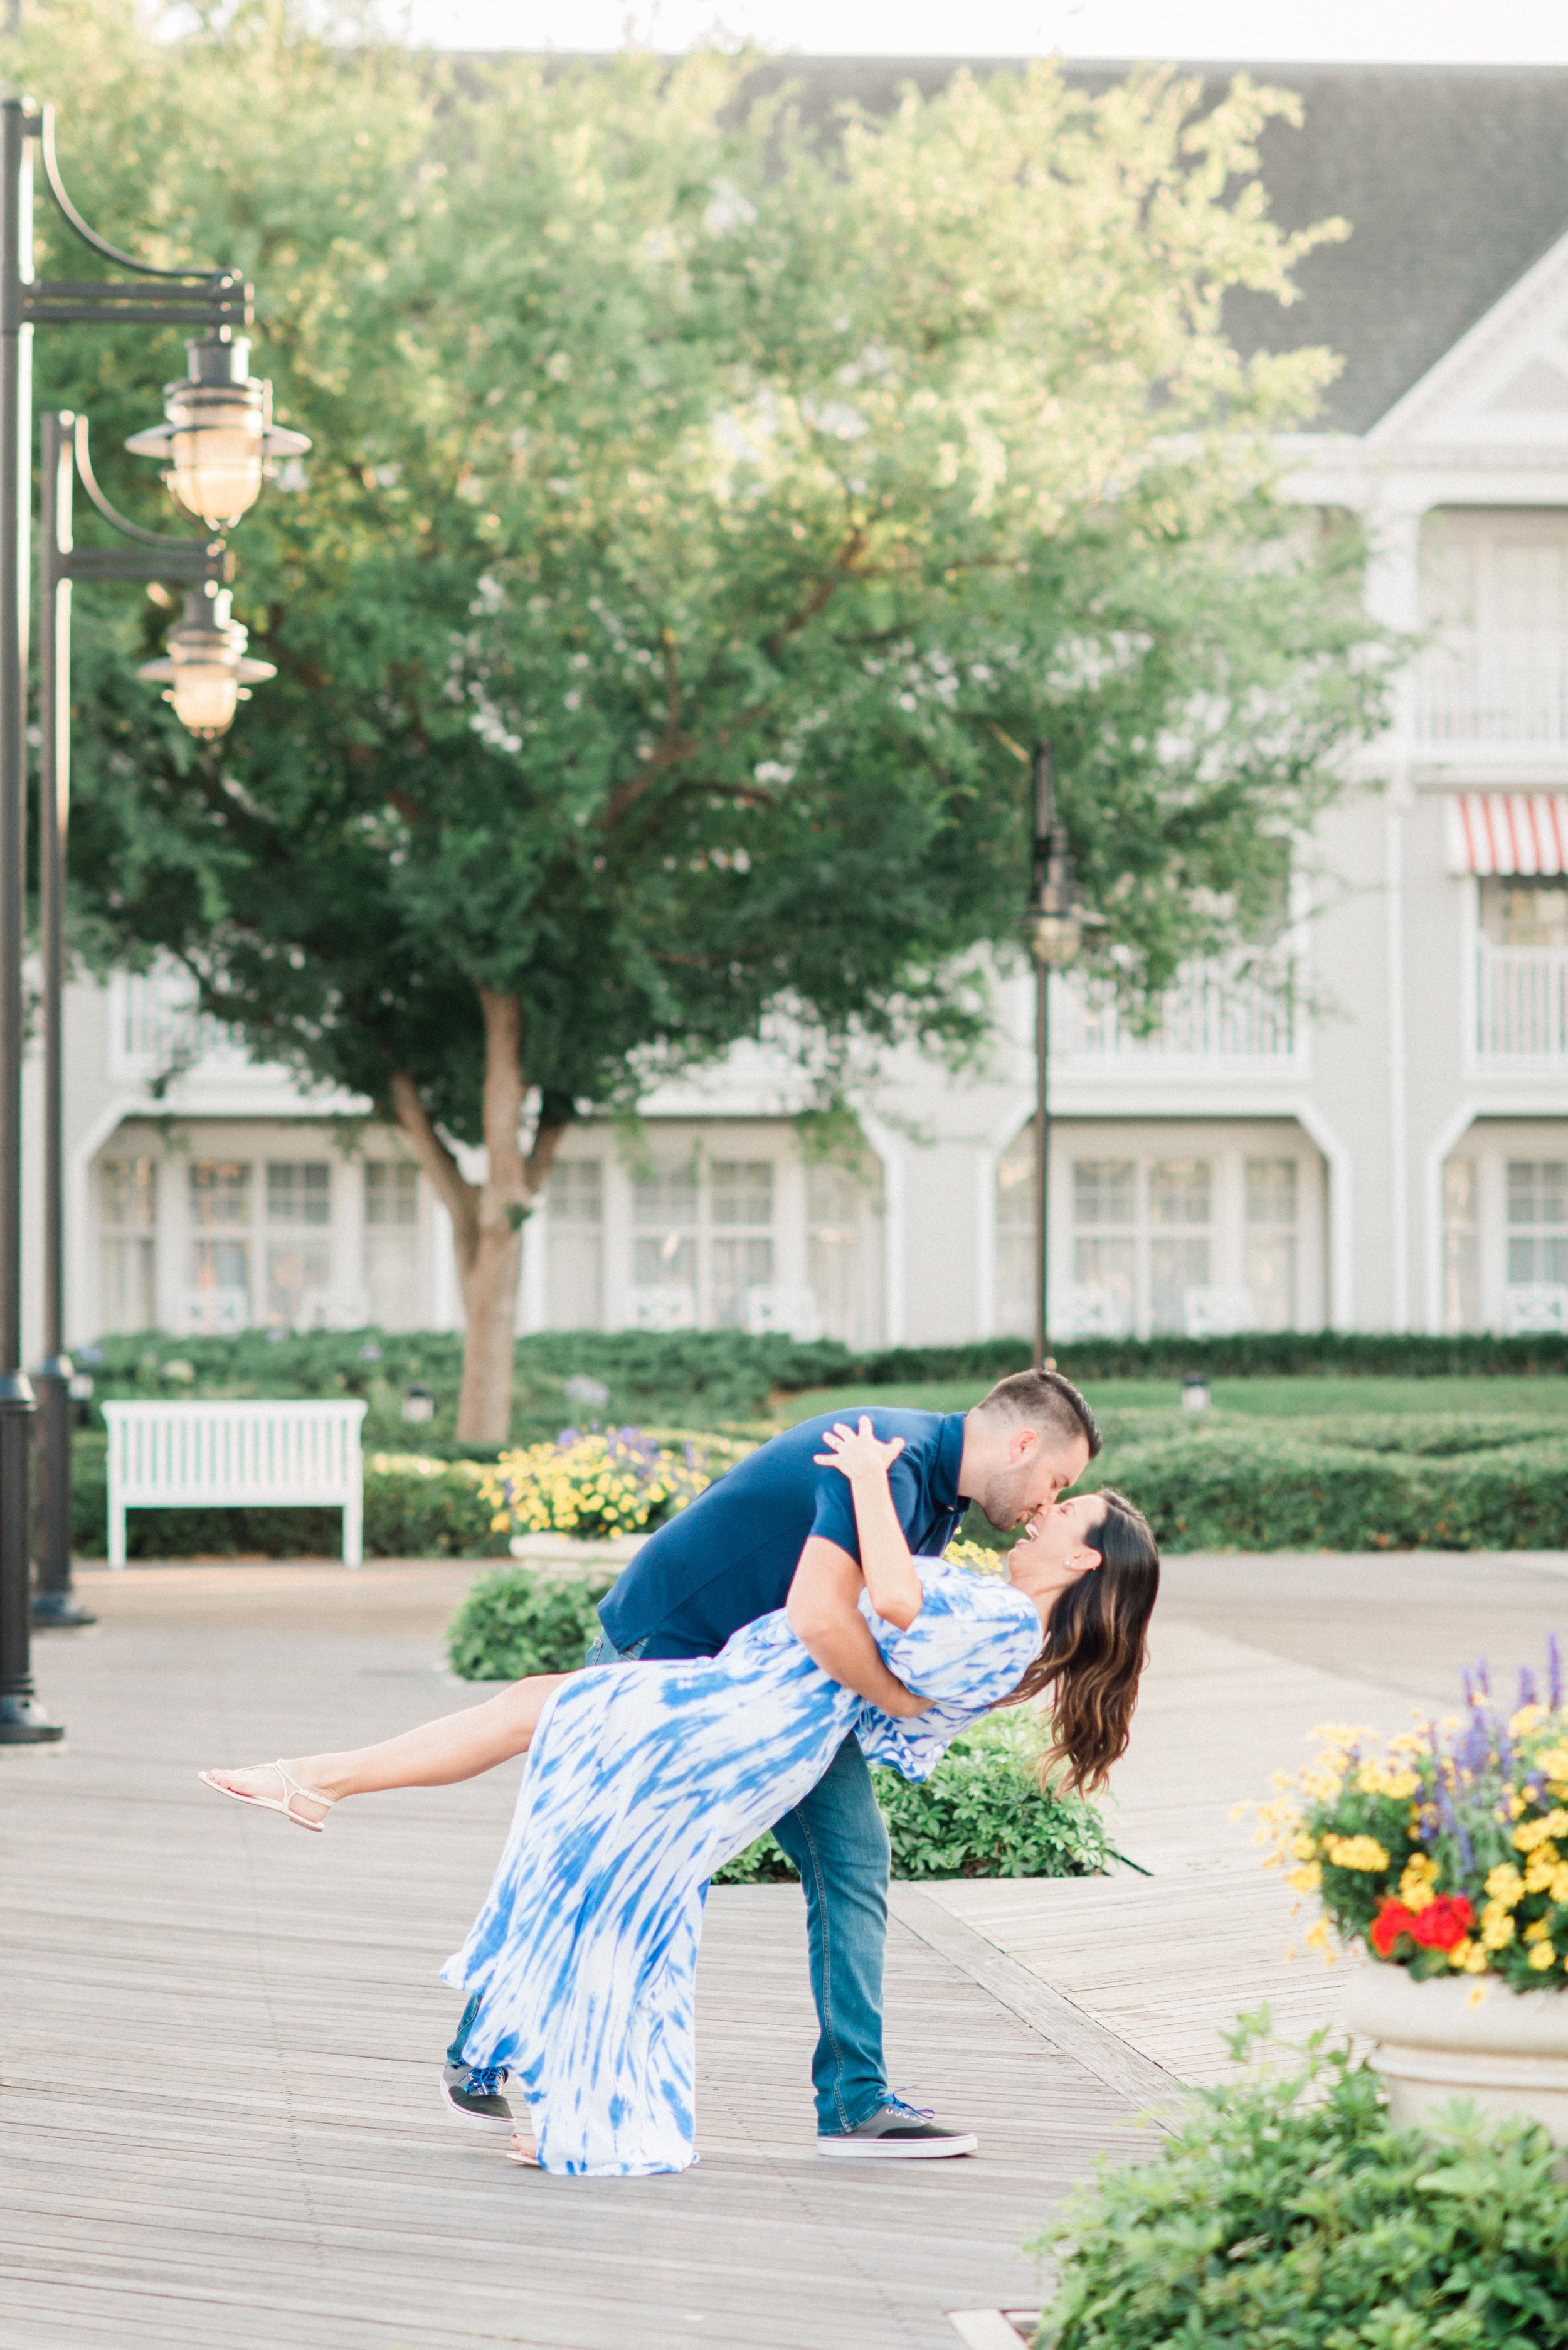 KateTaramykinStudios-Disney-Boardwalk-Couples-Portraits-KatMarc-4.jpg